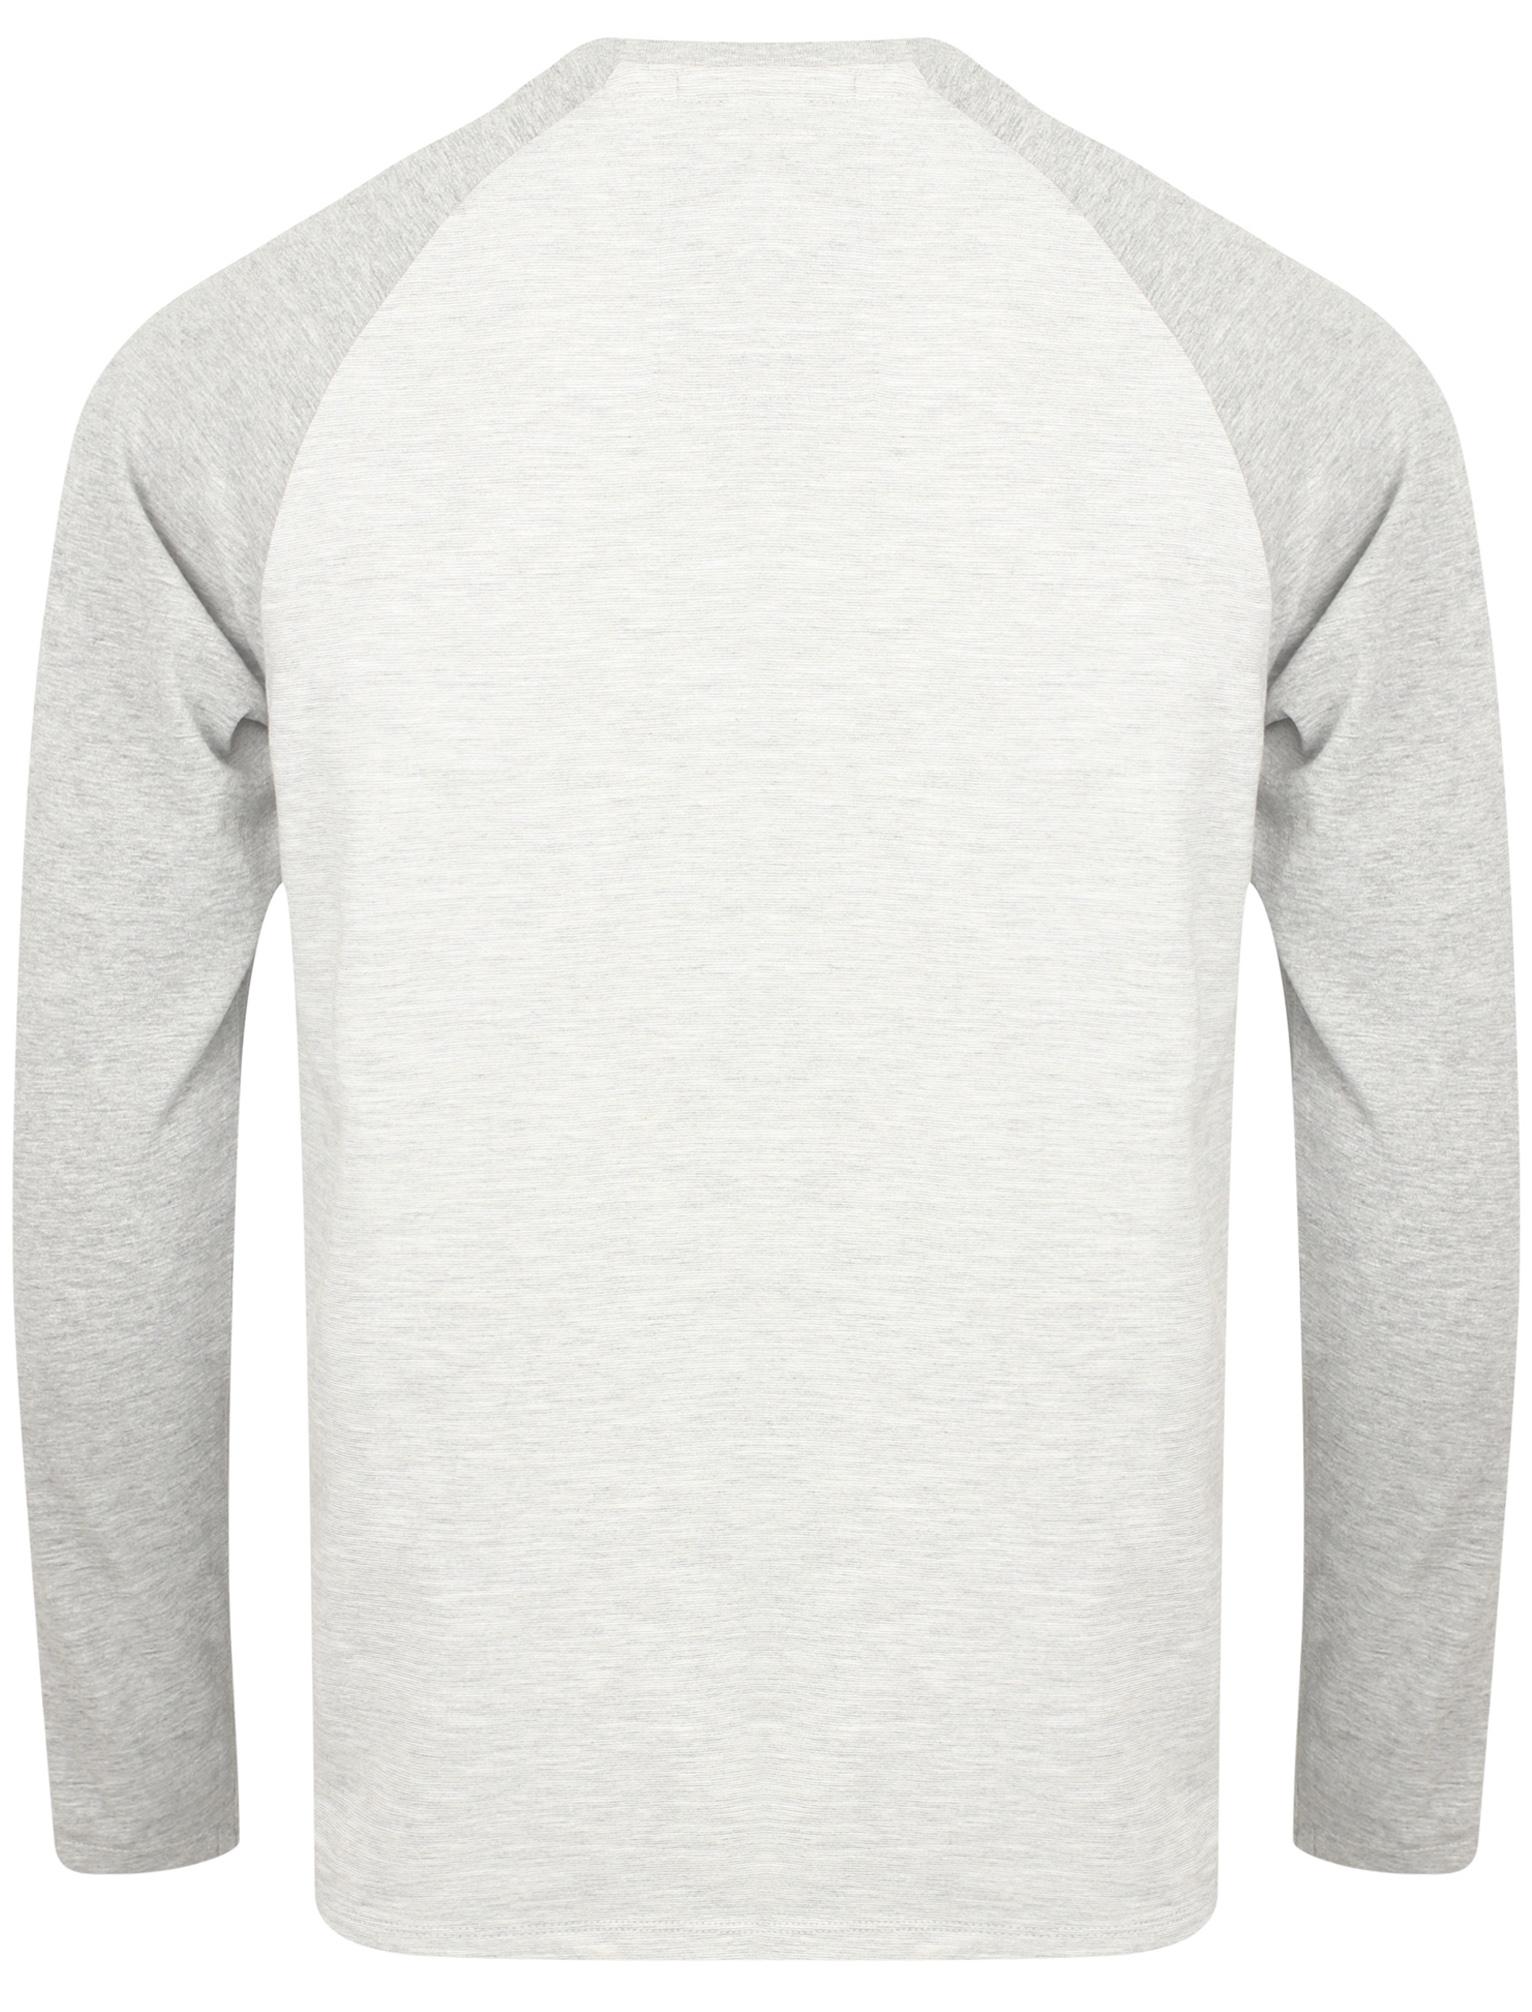 New-Tokyo-Laundry-Mens-Crew-Neck-Cotton-Blend-Long-Contrast-Sleeve-Top-Size-S-XL thumbnail 3